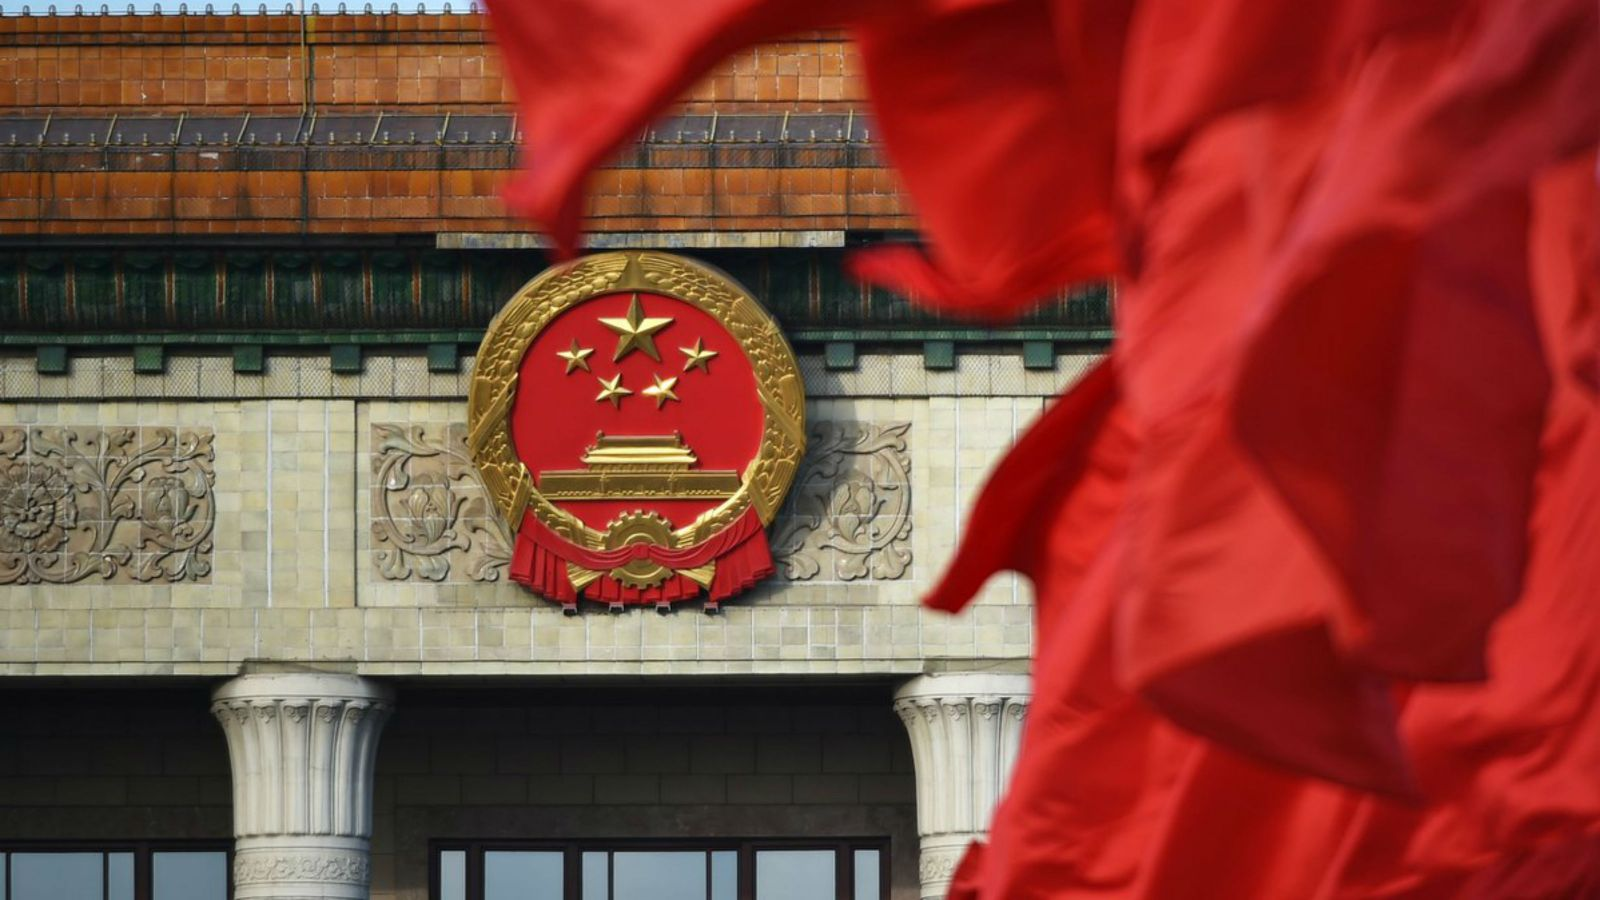 Image: Xinhua News Agency